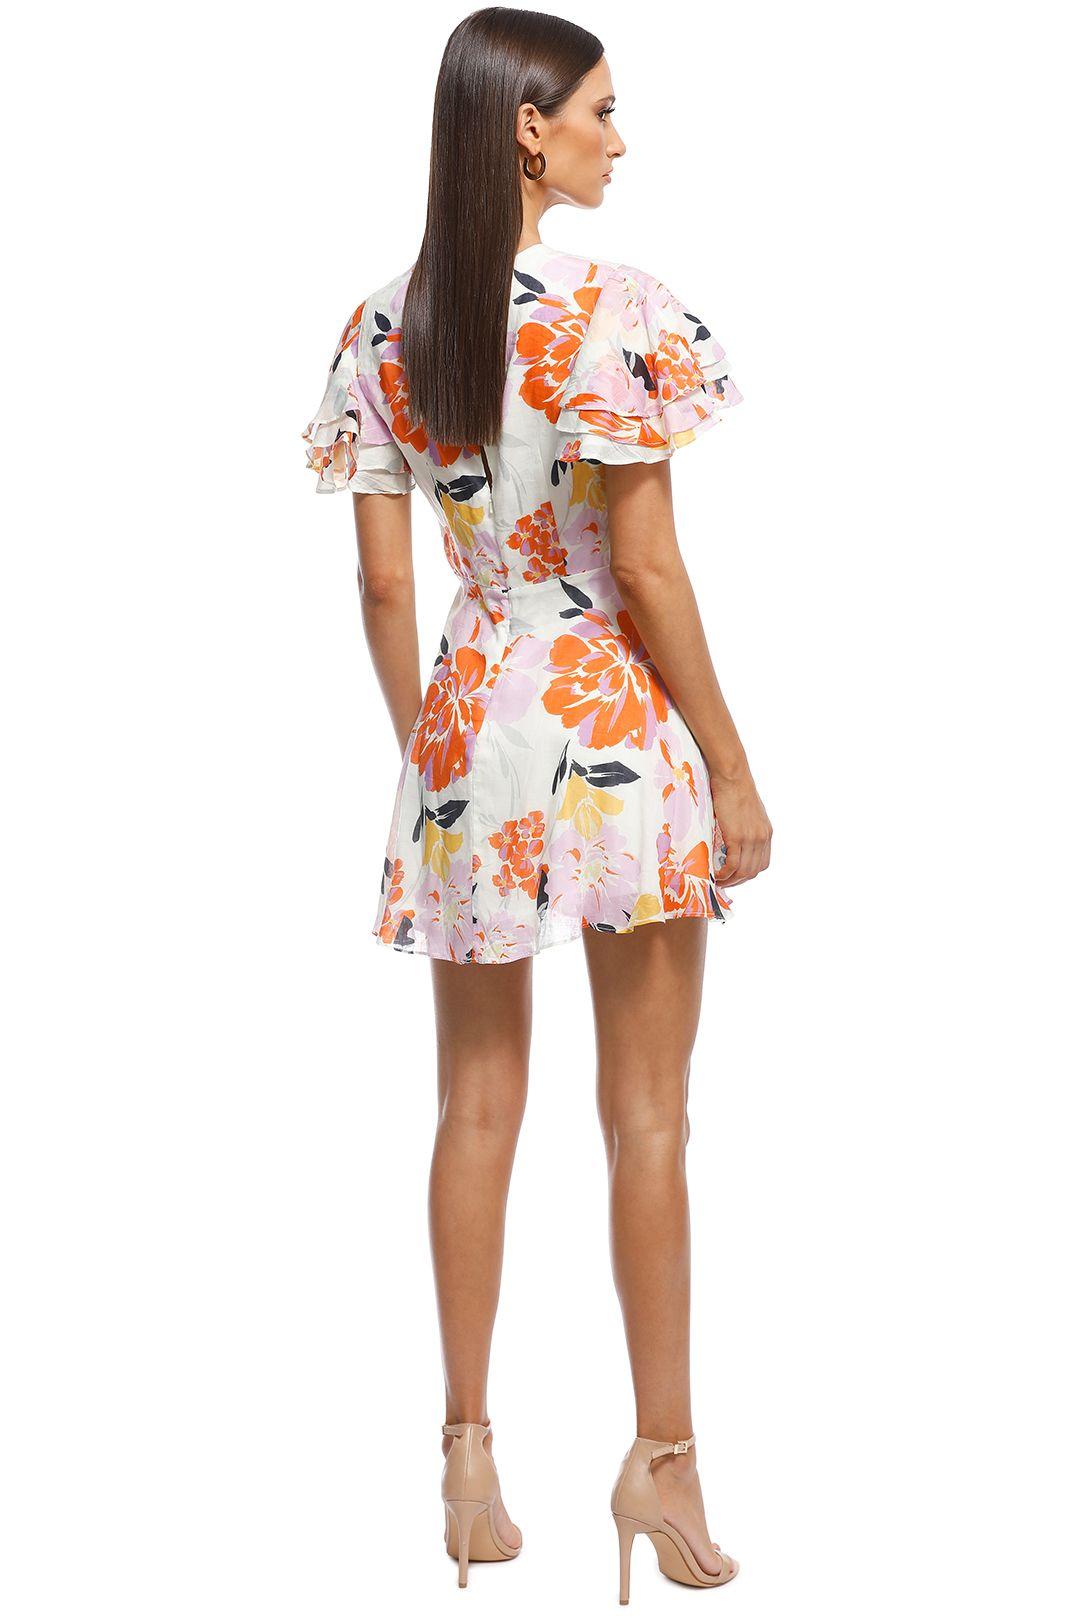 Talulah - Effervescent Mini Dress - Ivory Floral - Back